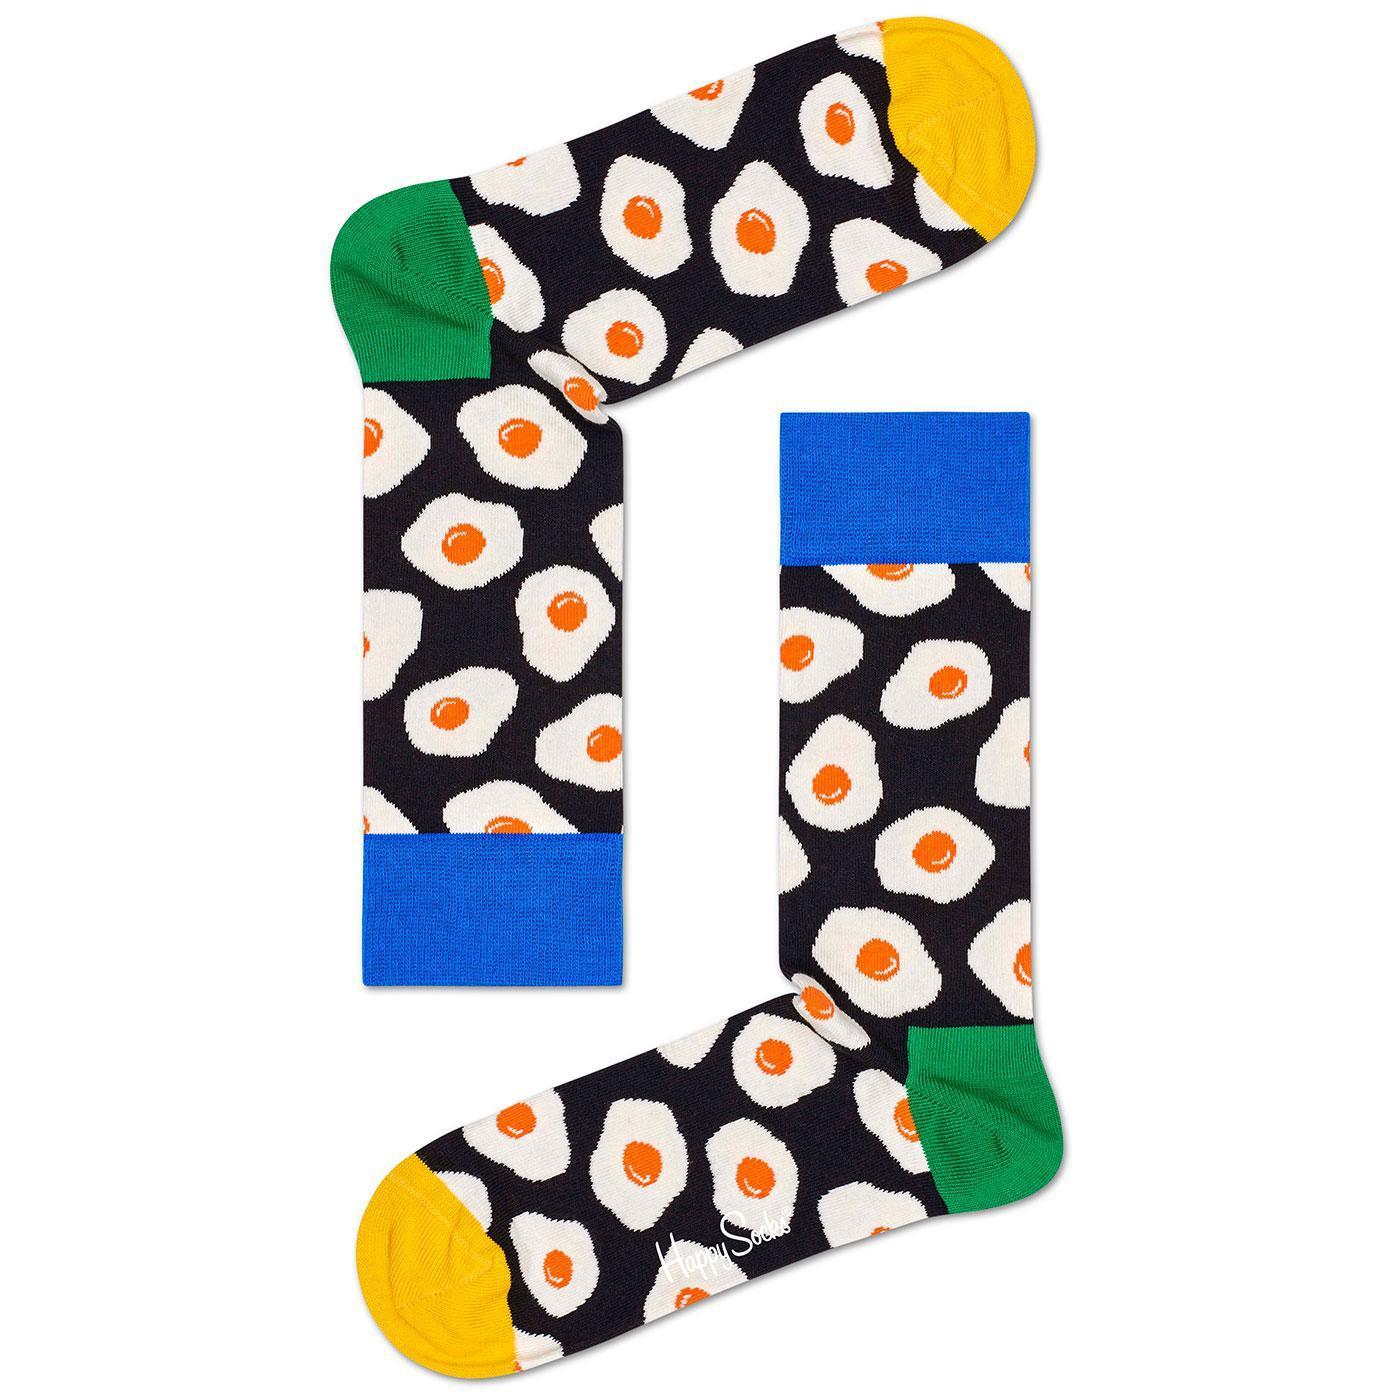 + HAPPY SOCKS Retro Sunny Side Up Fried Egg Socks